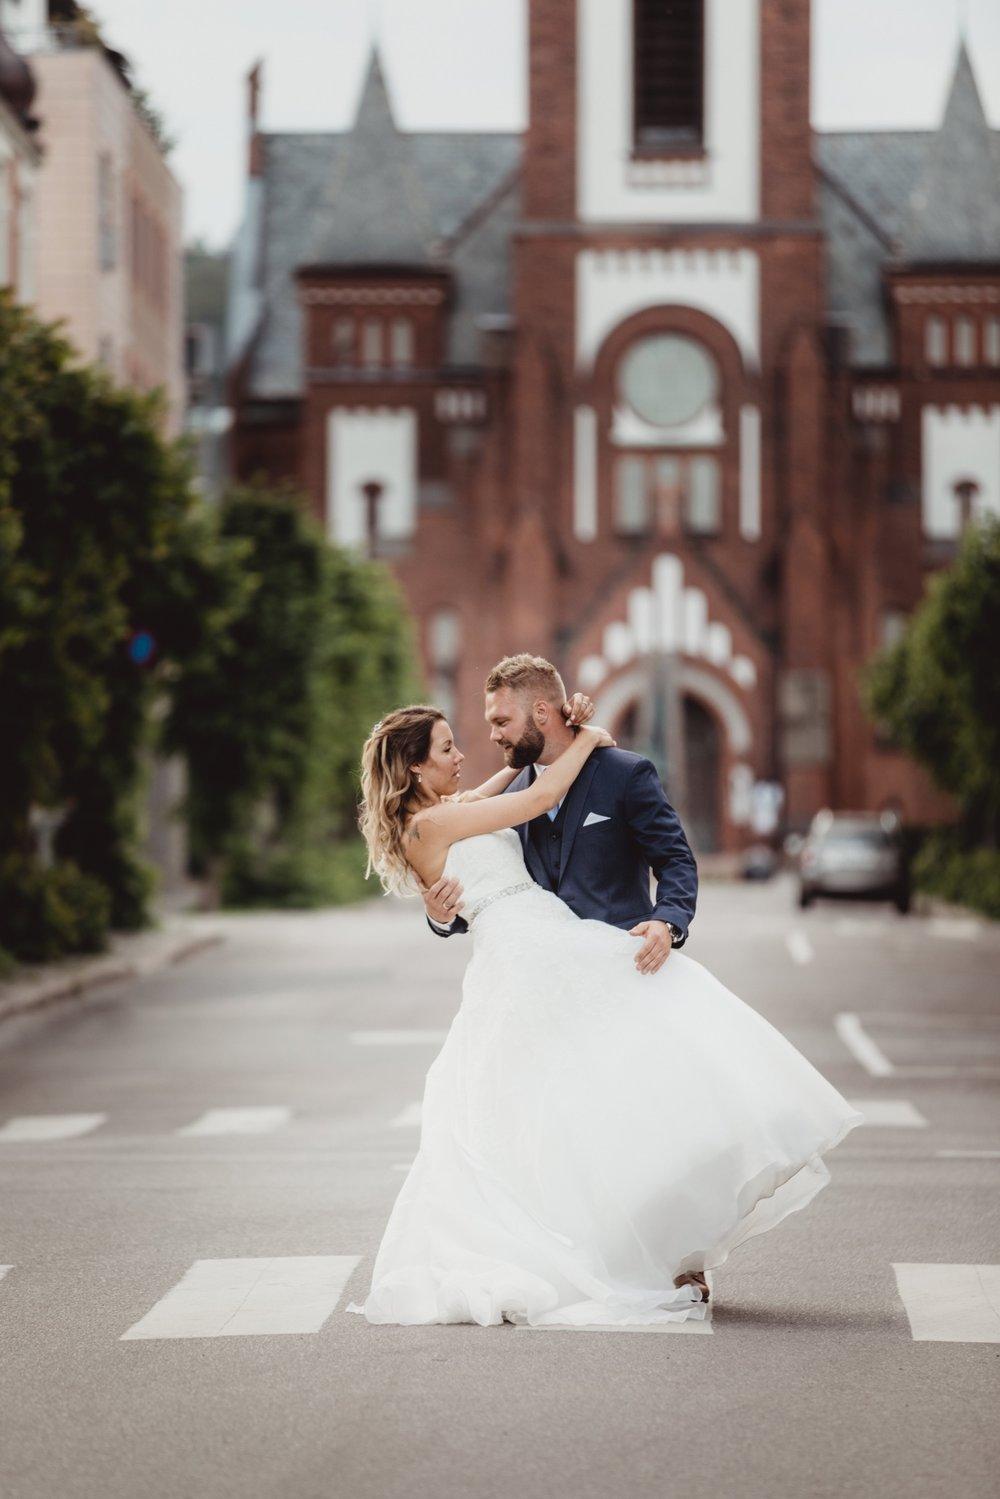 101_weddingphotographer_Bryllupsfotografering_Bryllupsbilder_fatmonkeyfoto_Bryllupsfotograf.jpg